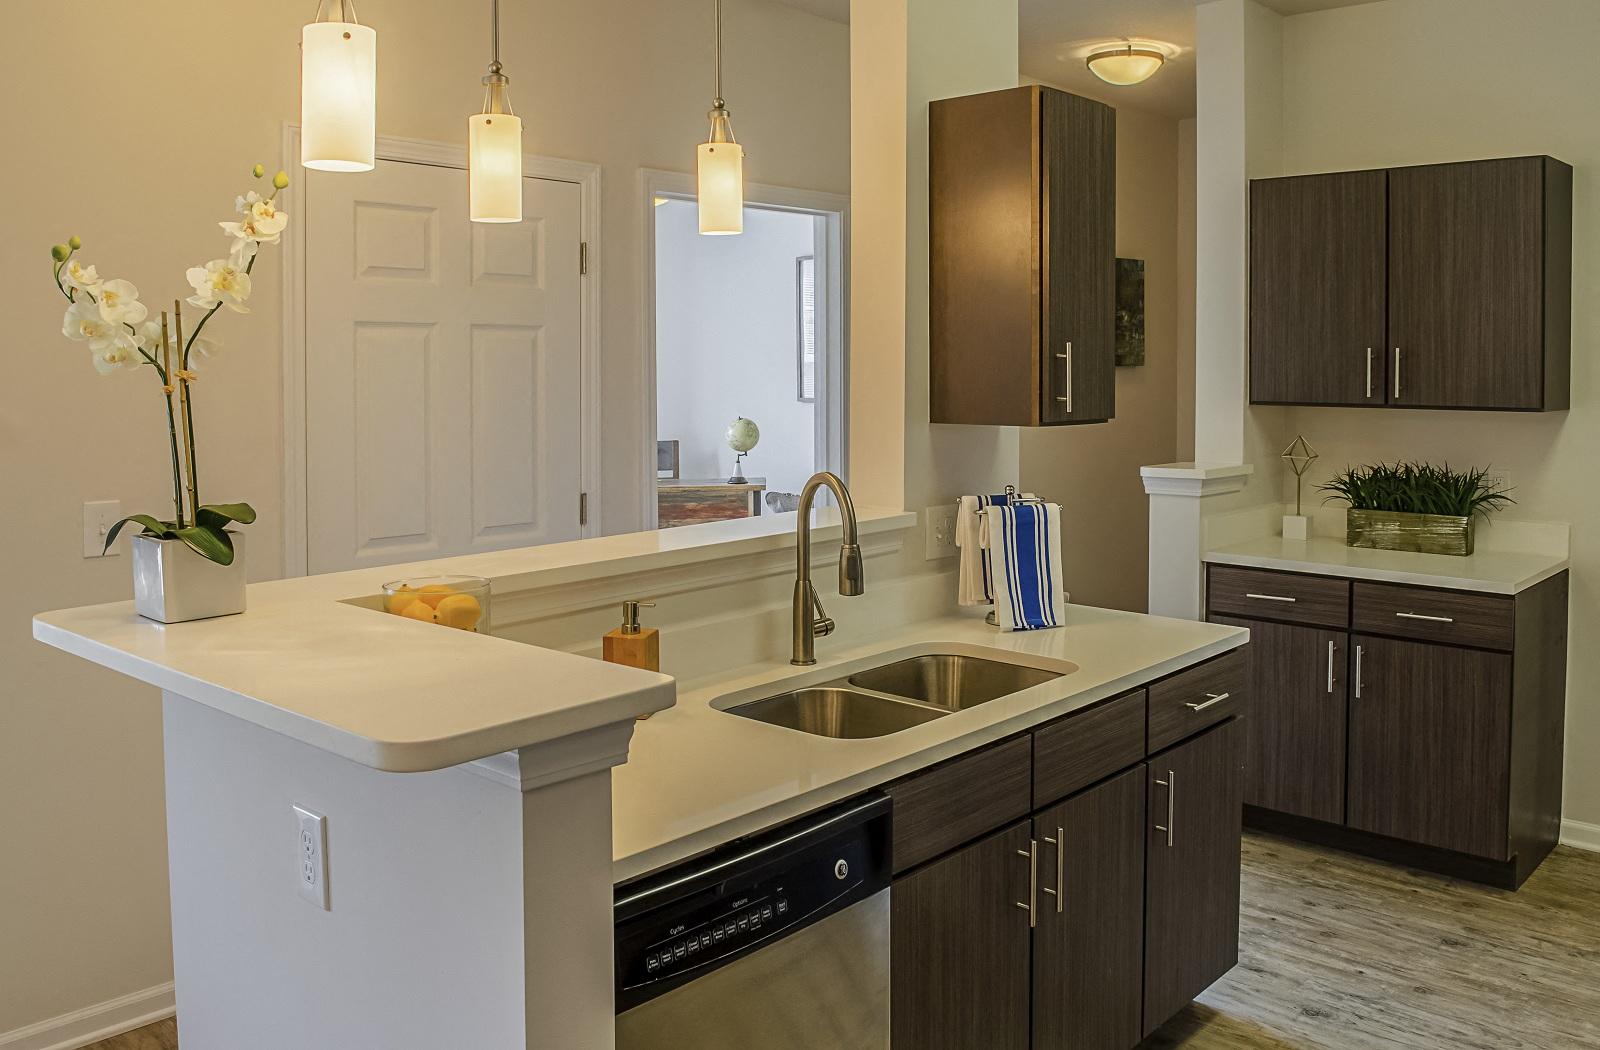 Upscale Kitchens